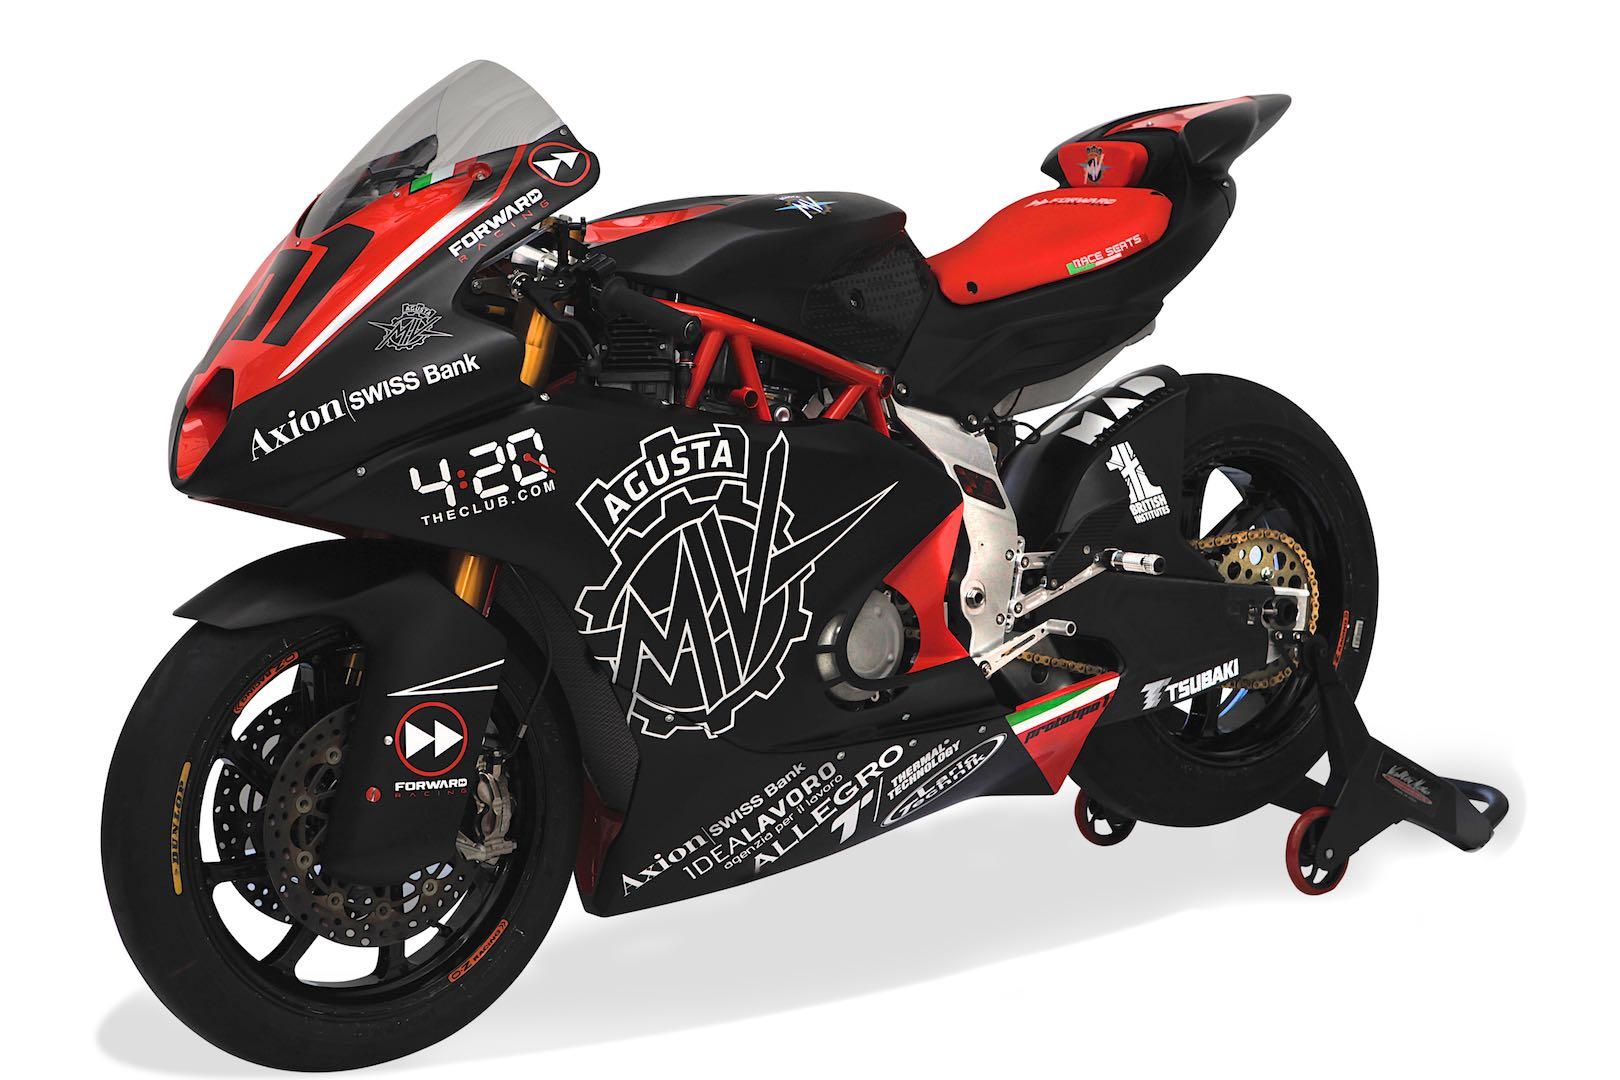 MV Agusta F2 Moto2 horsepower